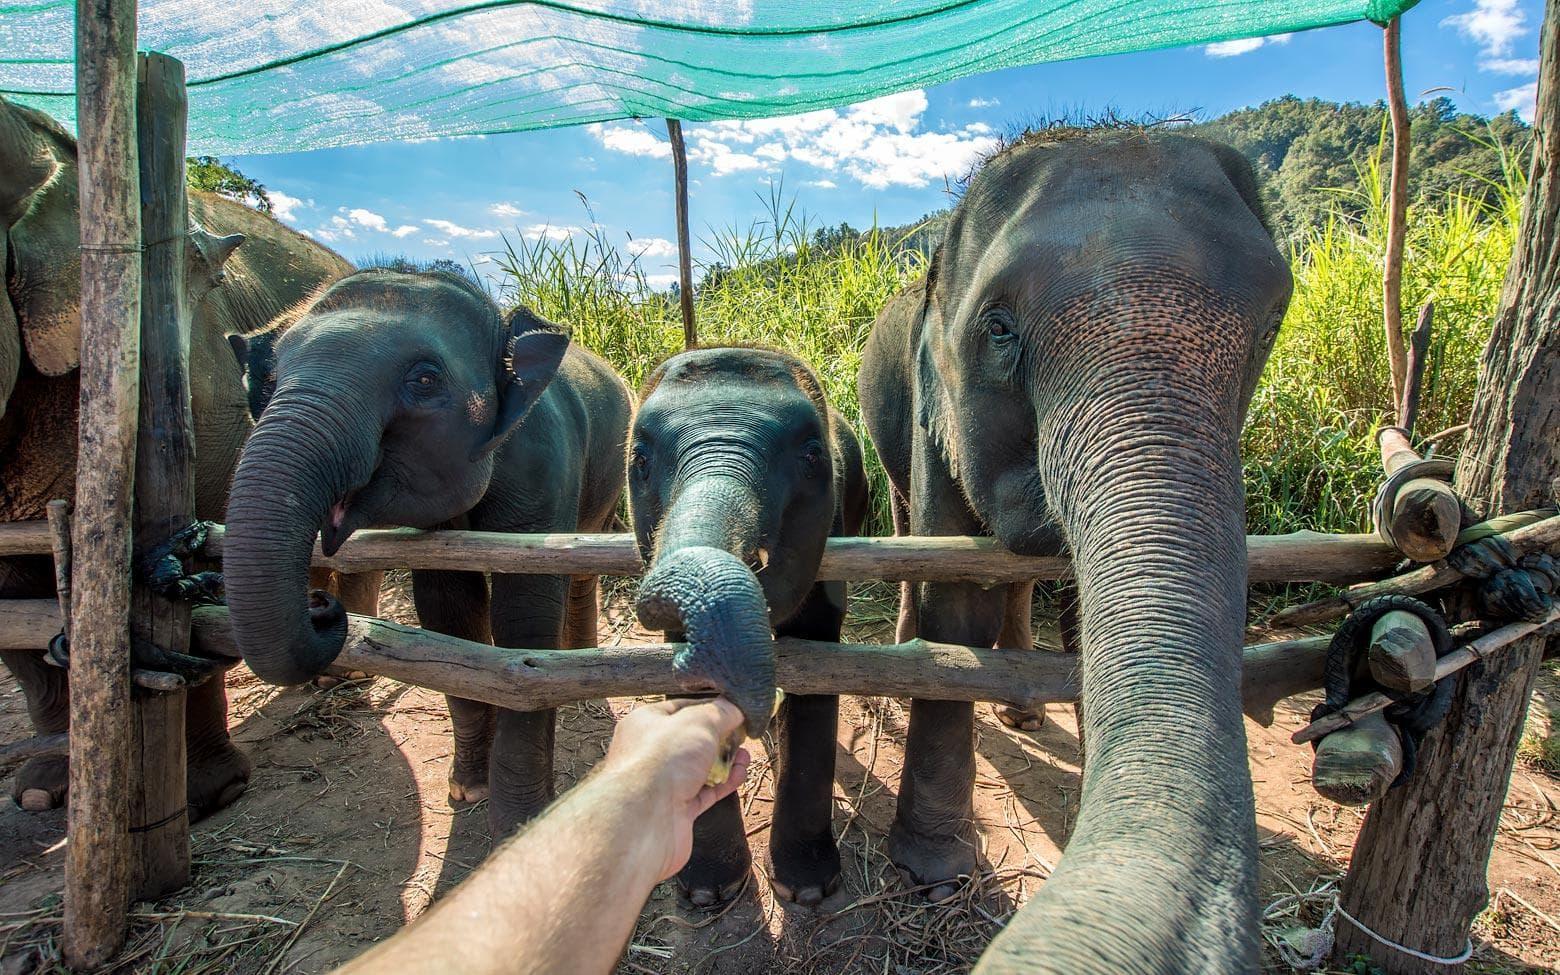 elephants eating bananas